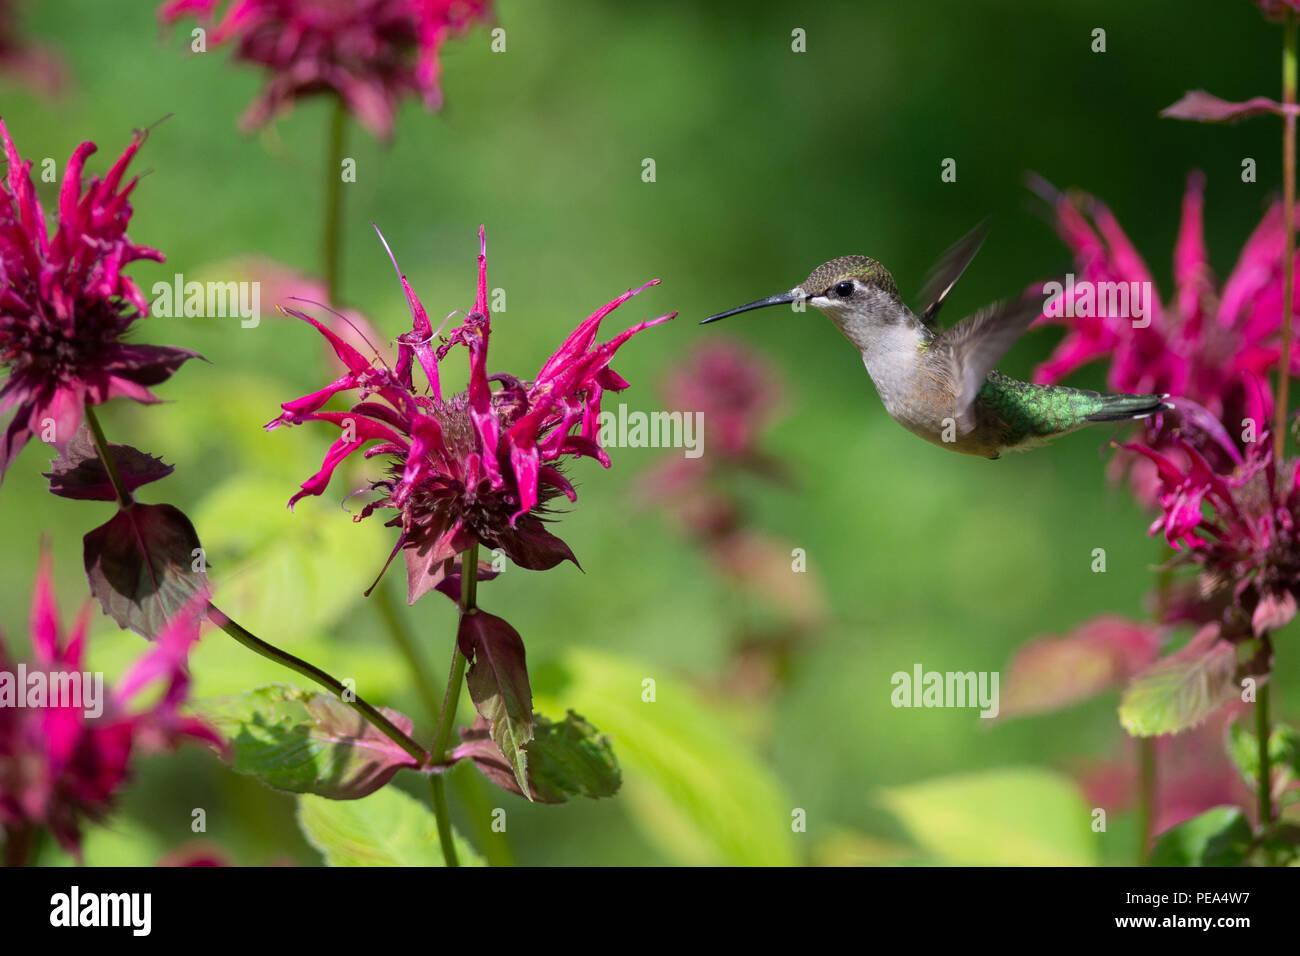 A Ruby-throated hummingbird flying near Bee Balm Flowers - Stock Image